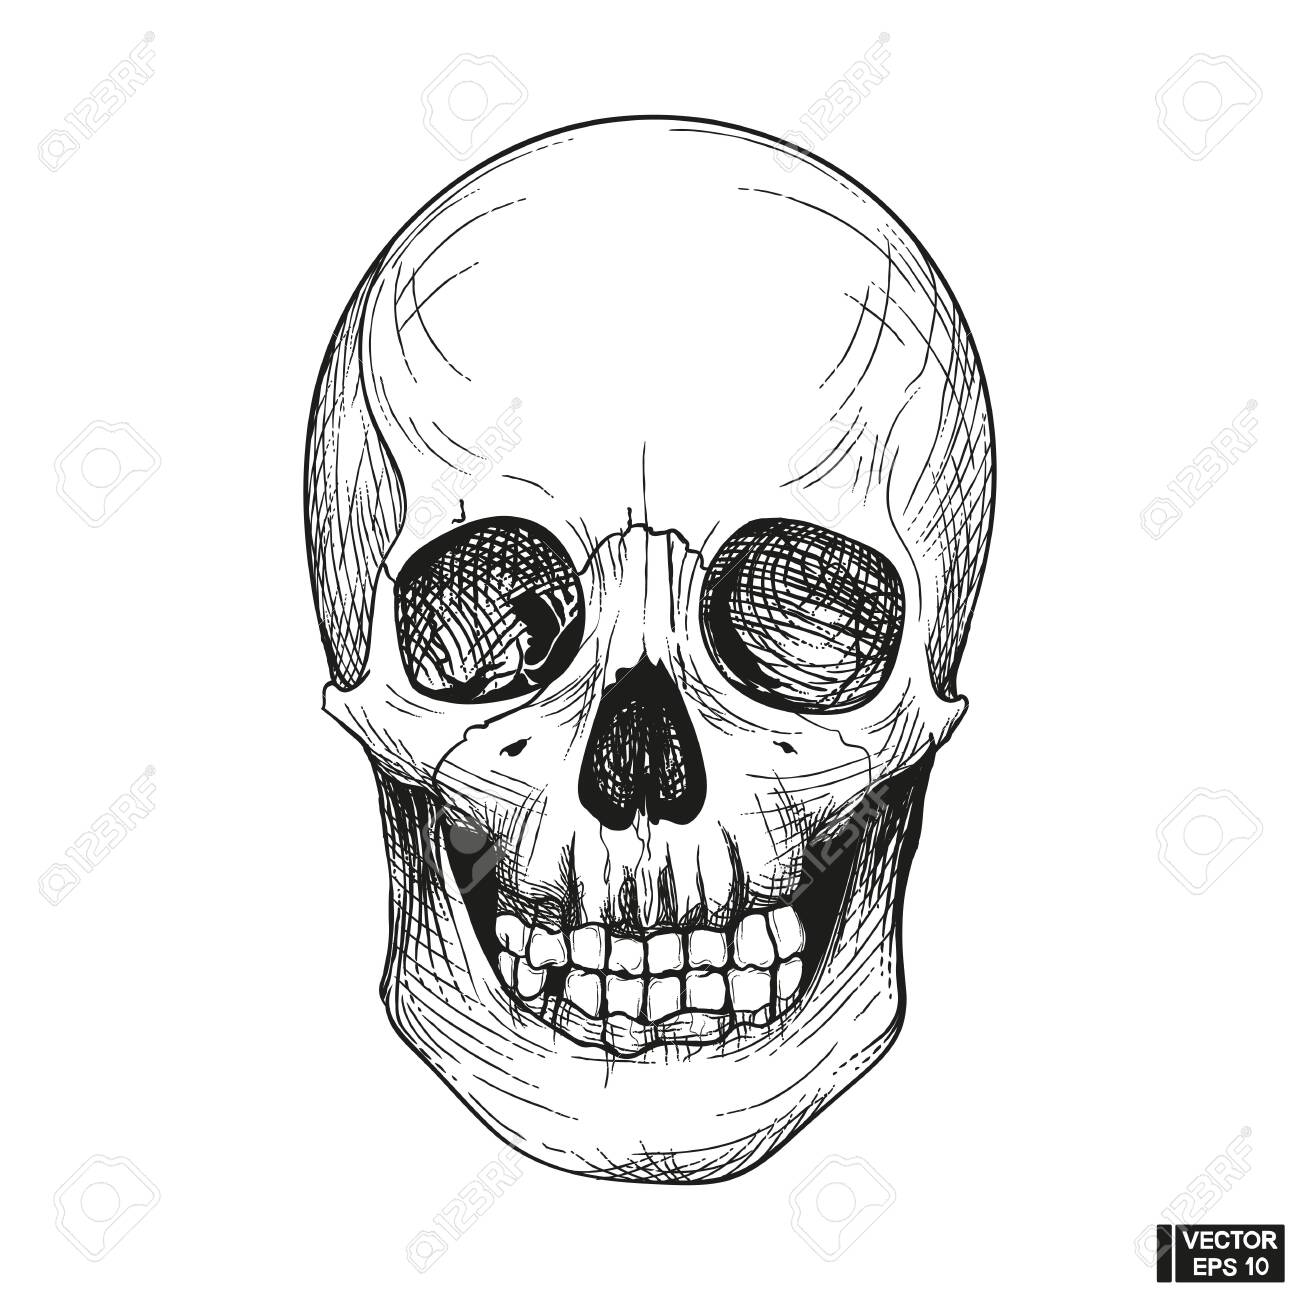 Vector illustration. Hand drawn anatomy human skull engraved style. Vintage halloween illustration. Skull with lower jaw - 144475316